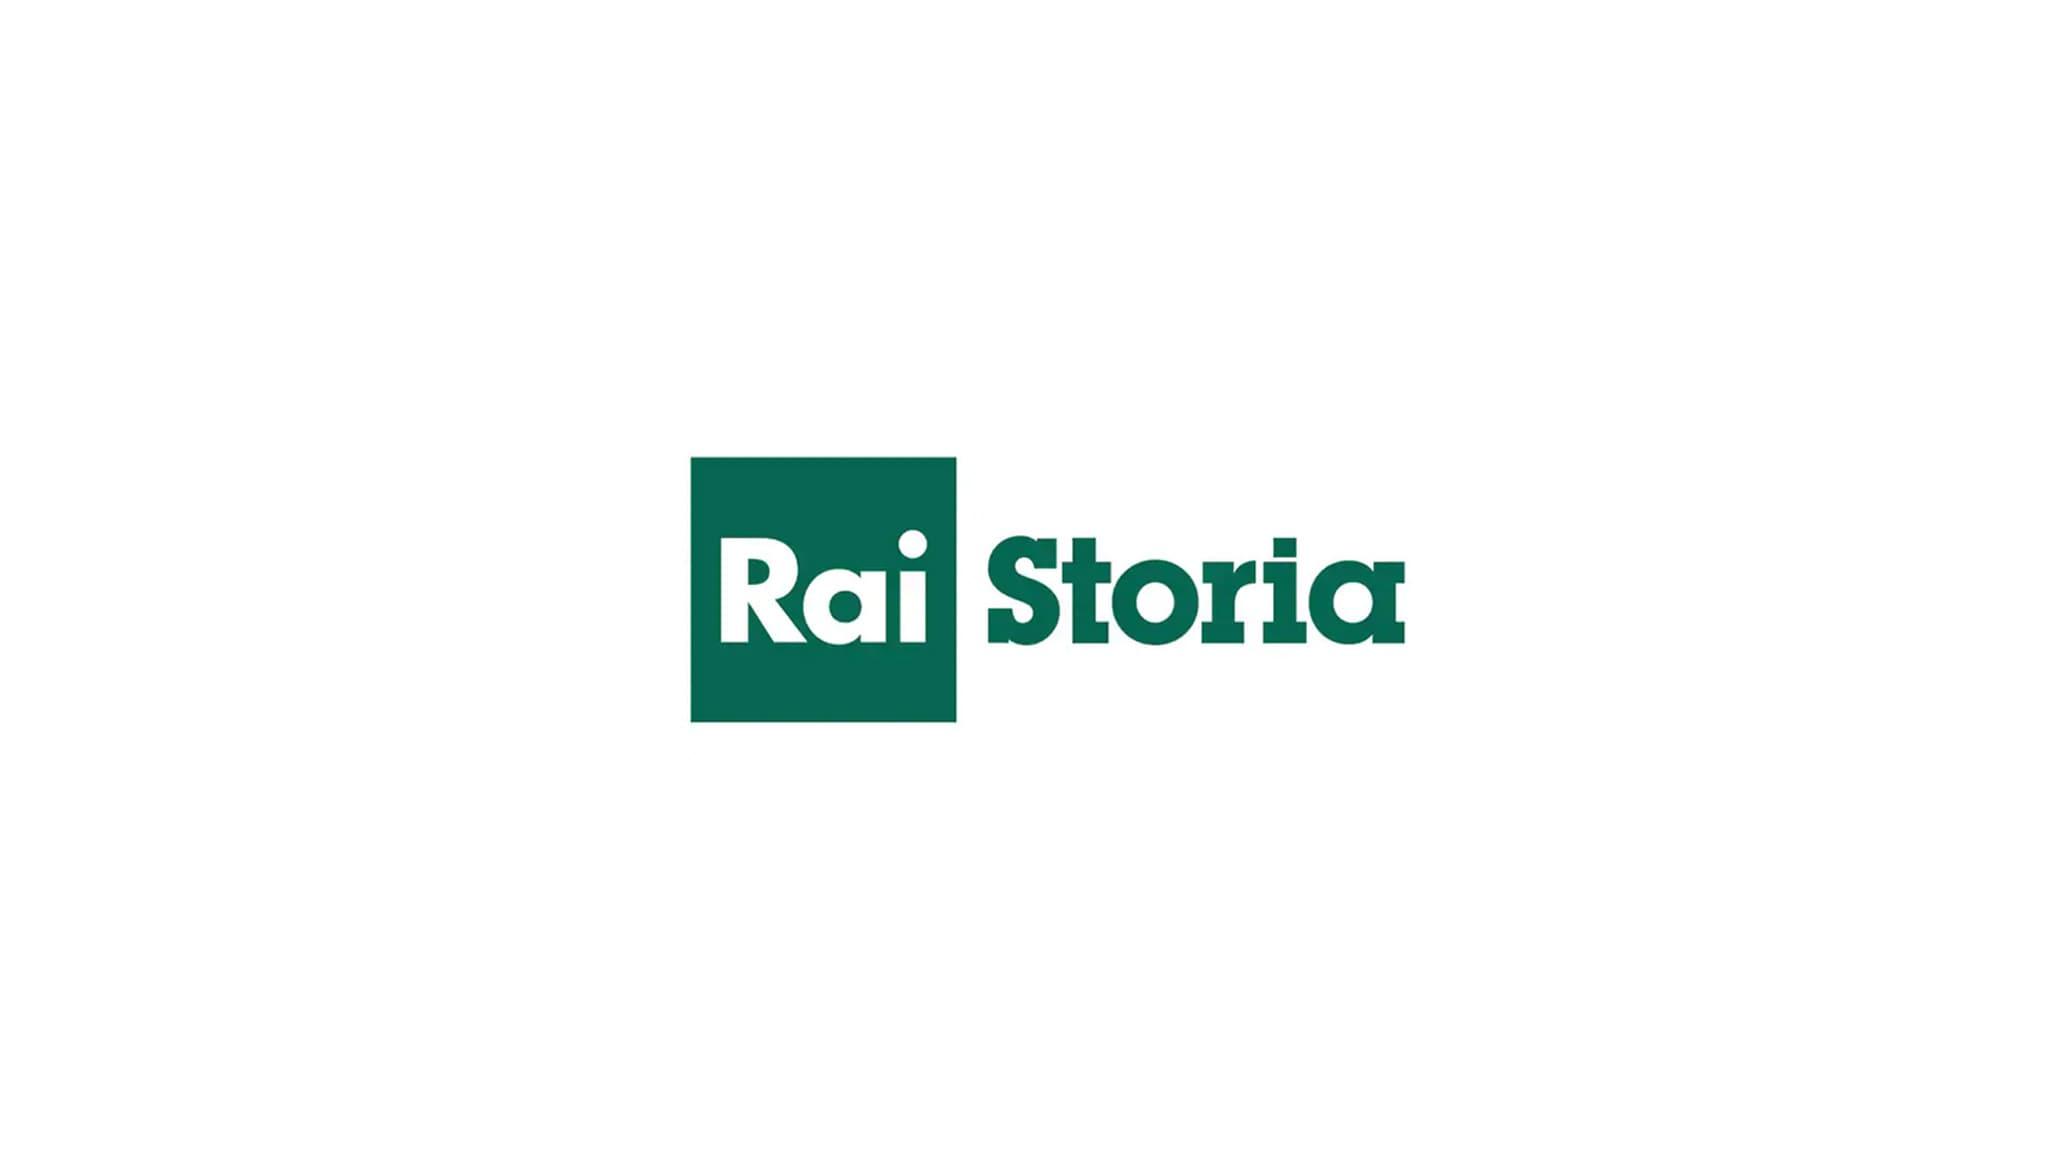 Rai Storia Bottecchia, l'ultima pedalata